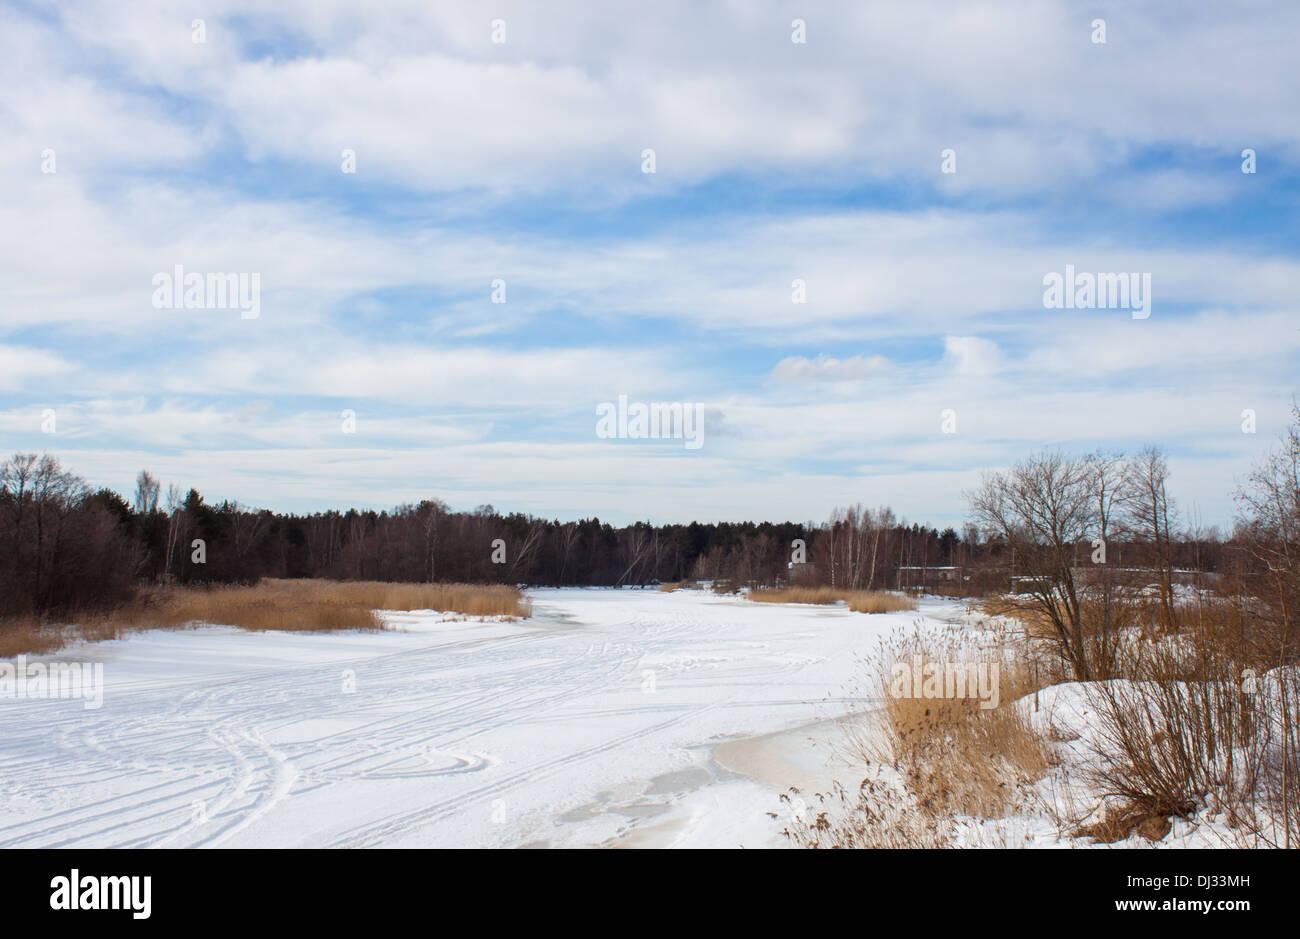 'snowy river' 'frozen river'  winter landscape snow 'ski run' forest blue sky clouds nature - Stock Image